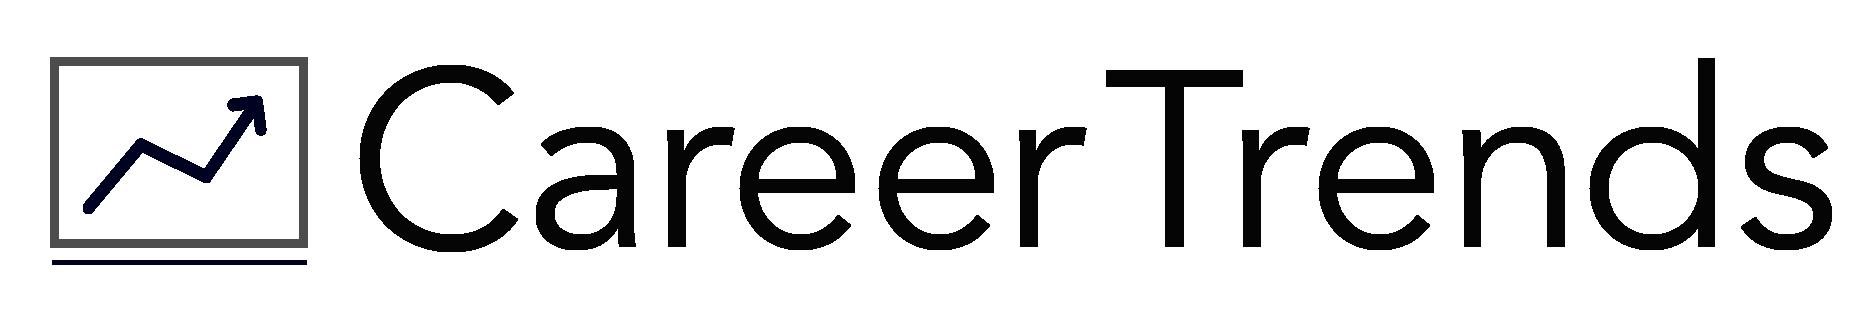 career-trends-logo.png